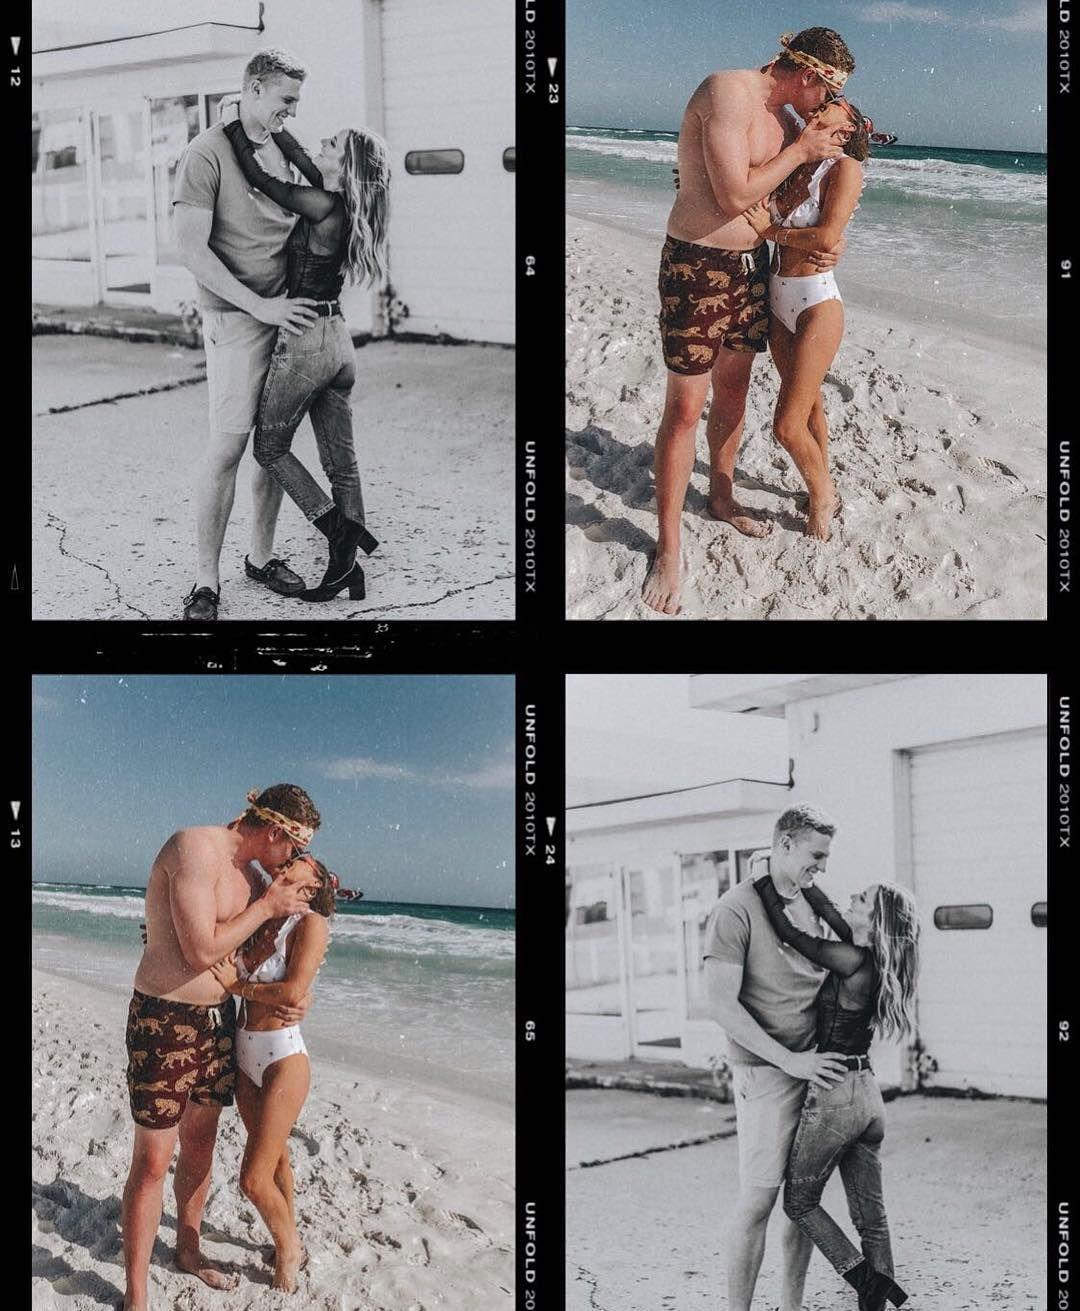 Polaroid Photo Using Unfold App Briknopf Polaroid Pictures Instagram Polaroid Template